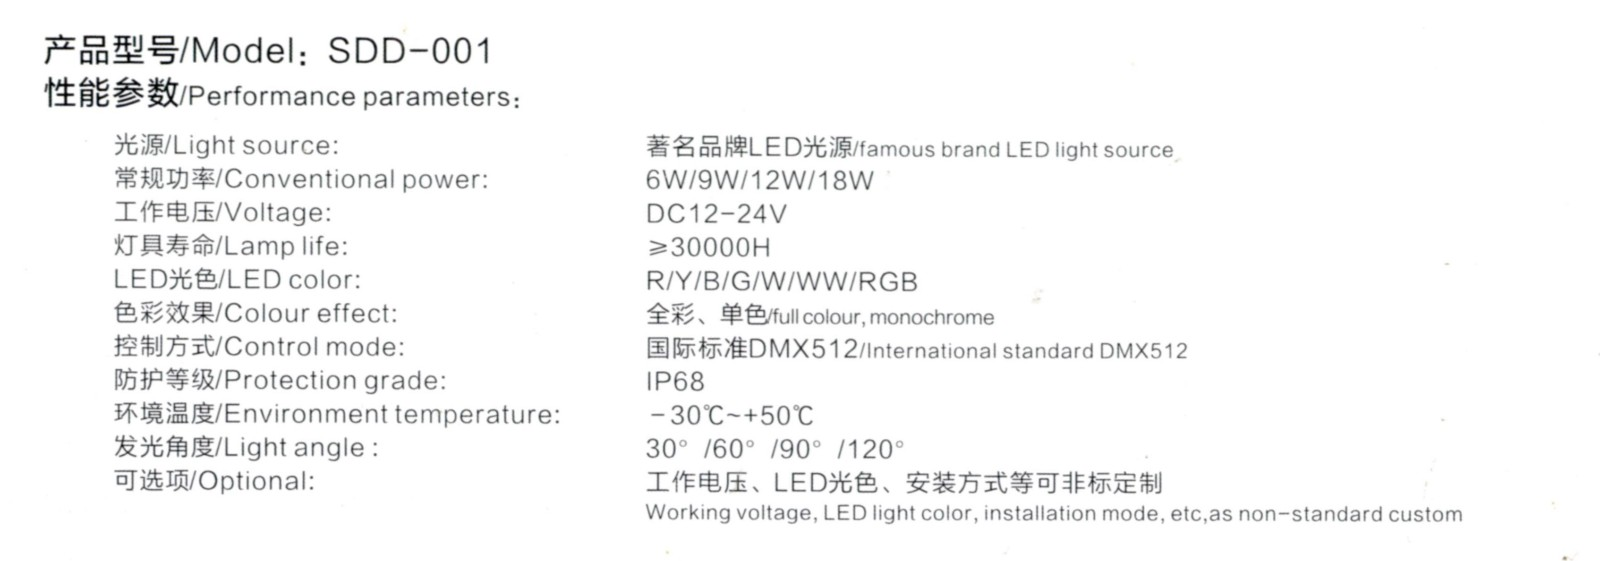 LED水底灯Model∶SDD-001参数.jpg